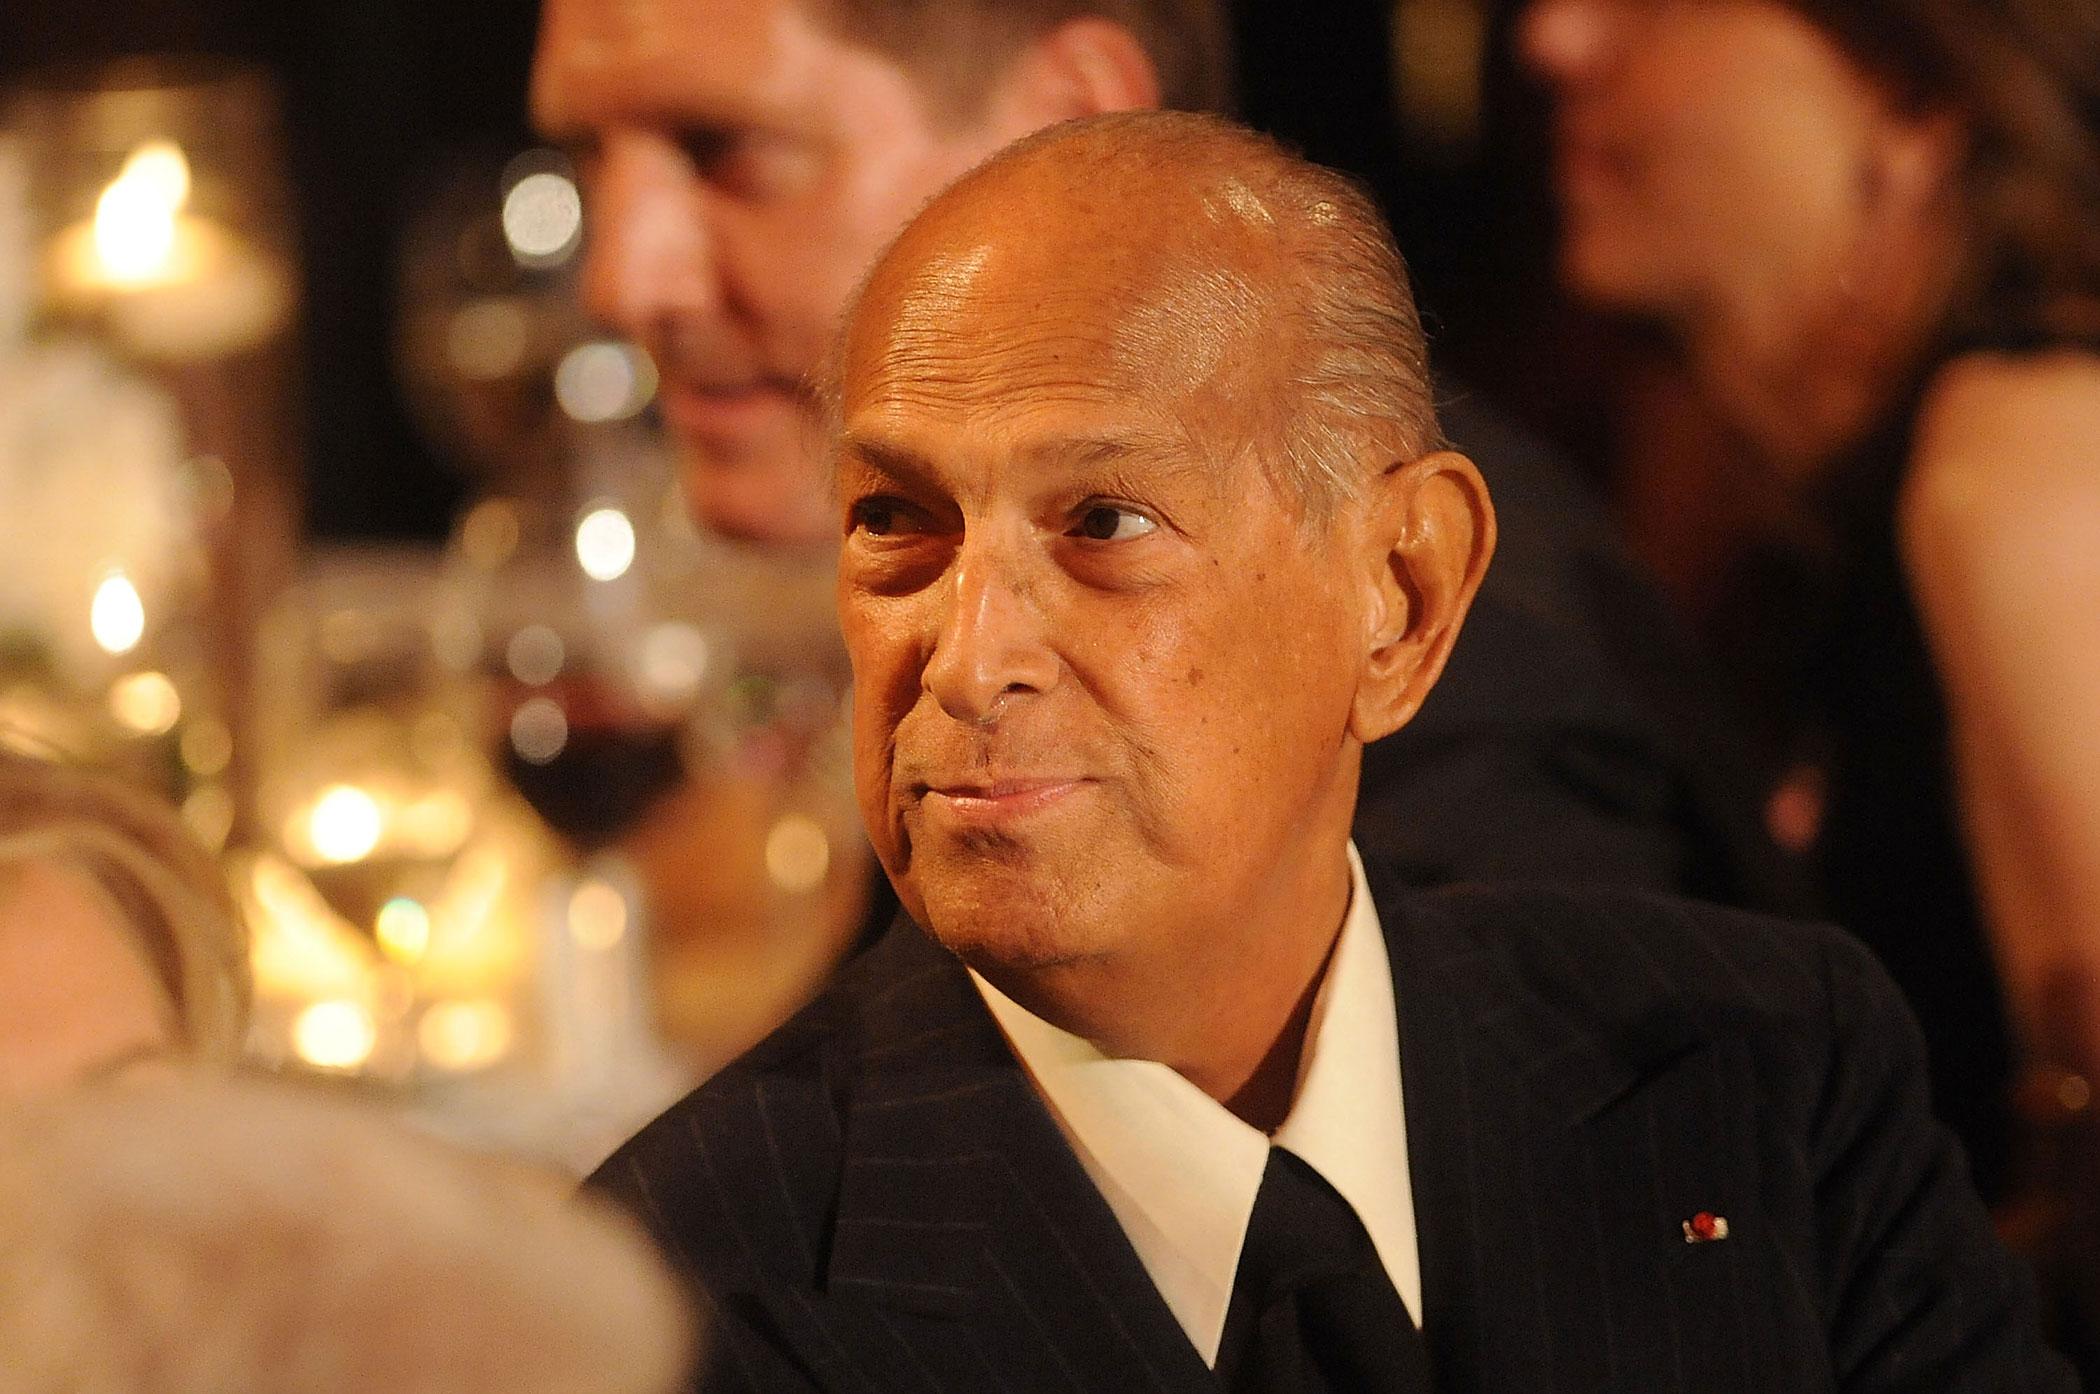 Designer Oscar de la Renta attends the 2014 Carnegie Hall Medal Of Excellence Gala Honoring Oscar De La Renta at The Plaza Hotel on April 24, 2014 in New York City.